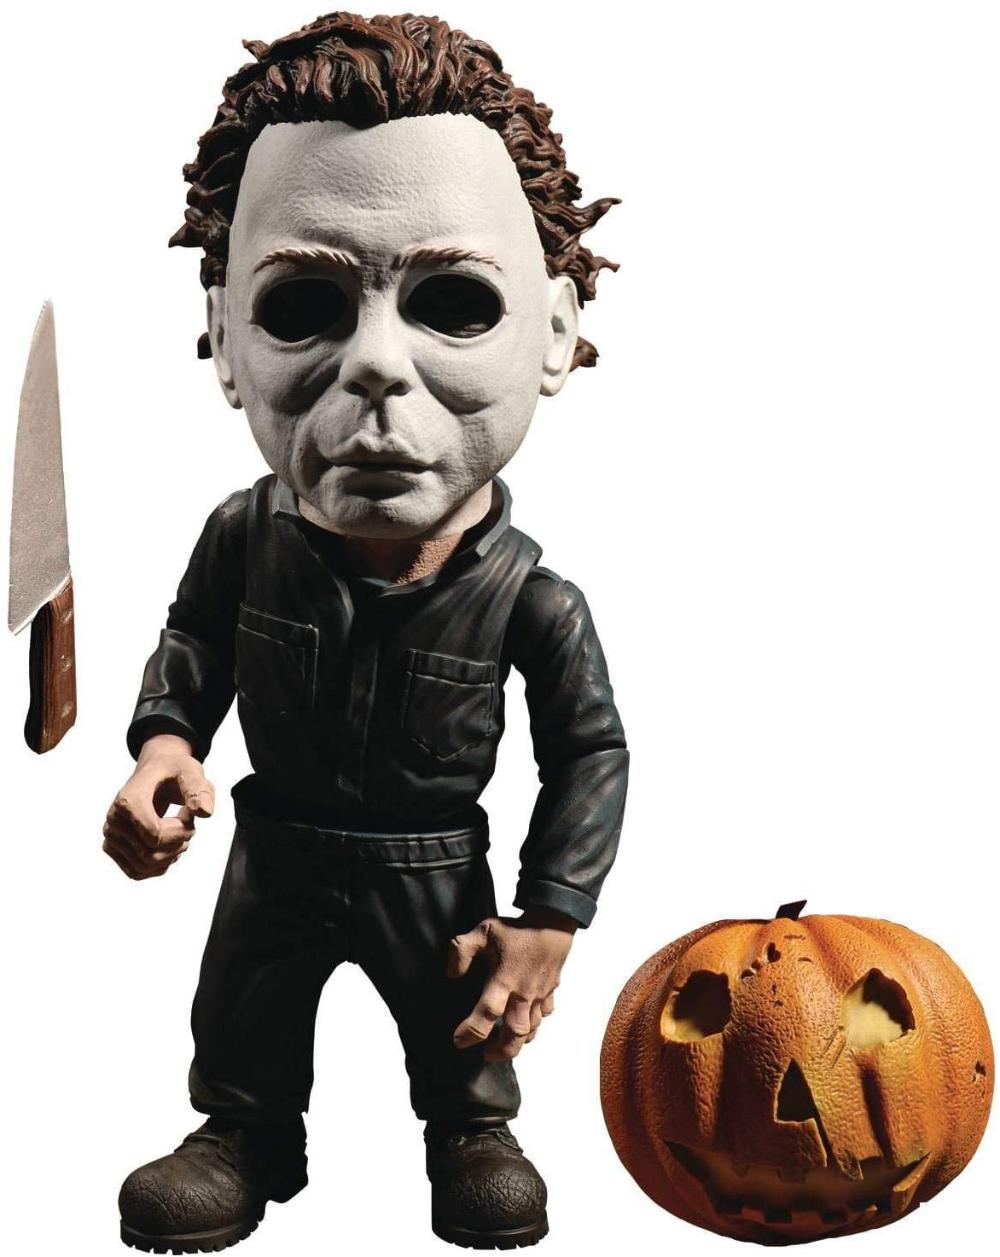 Mezco Michael Myers Halloween Figure 2020 Halloween Mezco Toyz (1978): Michael Myers Figure: Amazon.co.uk